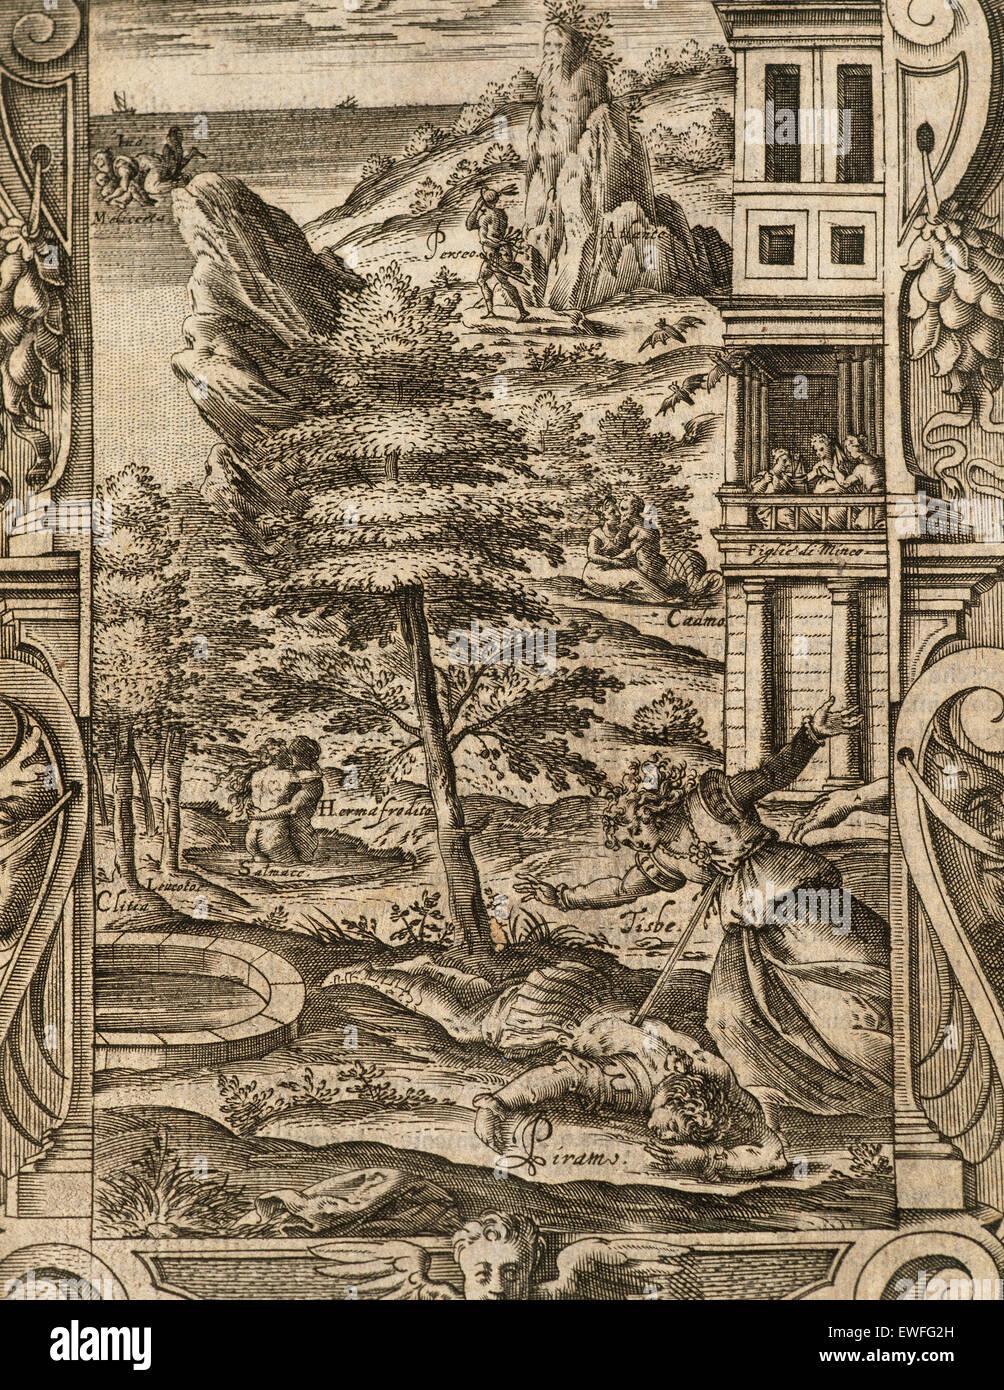 (Publius Ovidius Naso Ovid (43 V.chr.-17 N.chr.). lateinische Dichter. Metamorphosen 2-8 ad. Buch iv. kupferstich Stockfoto